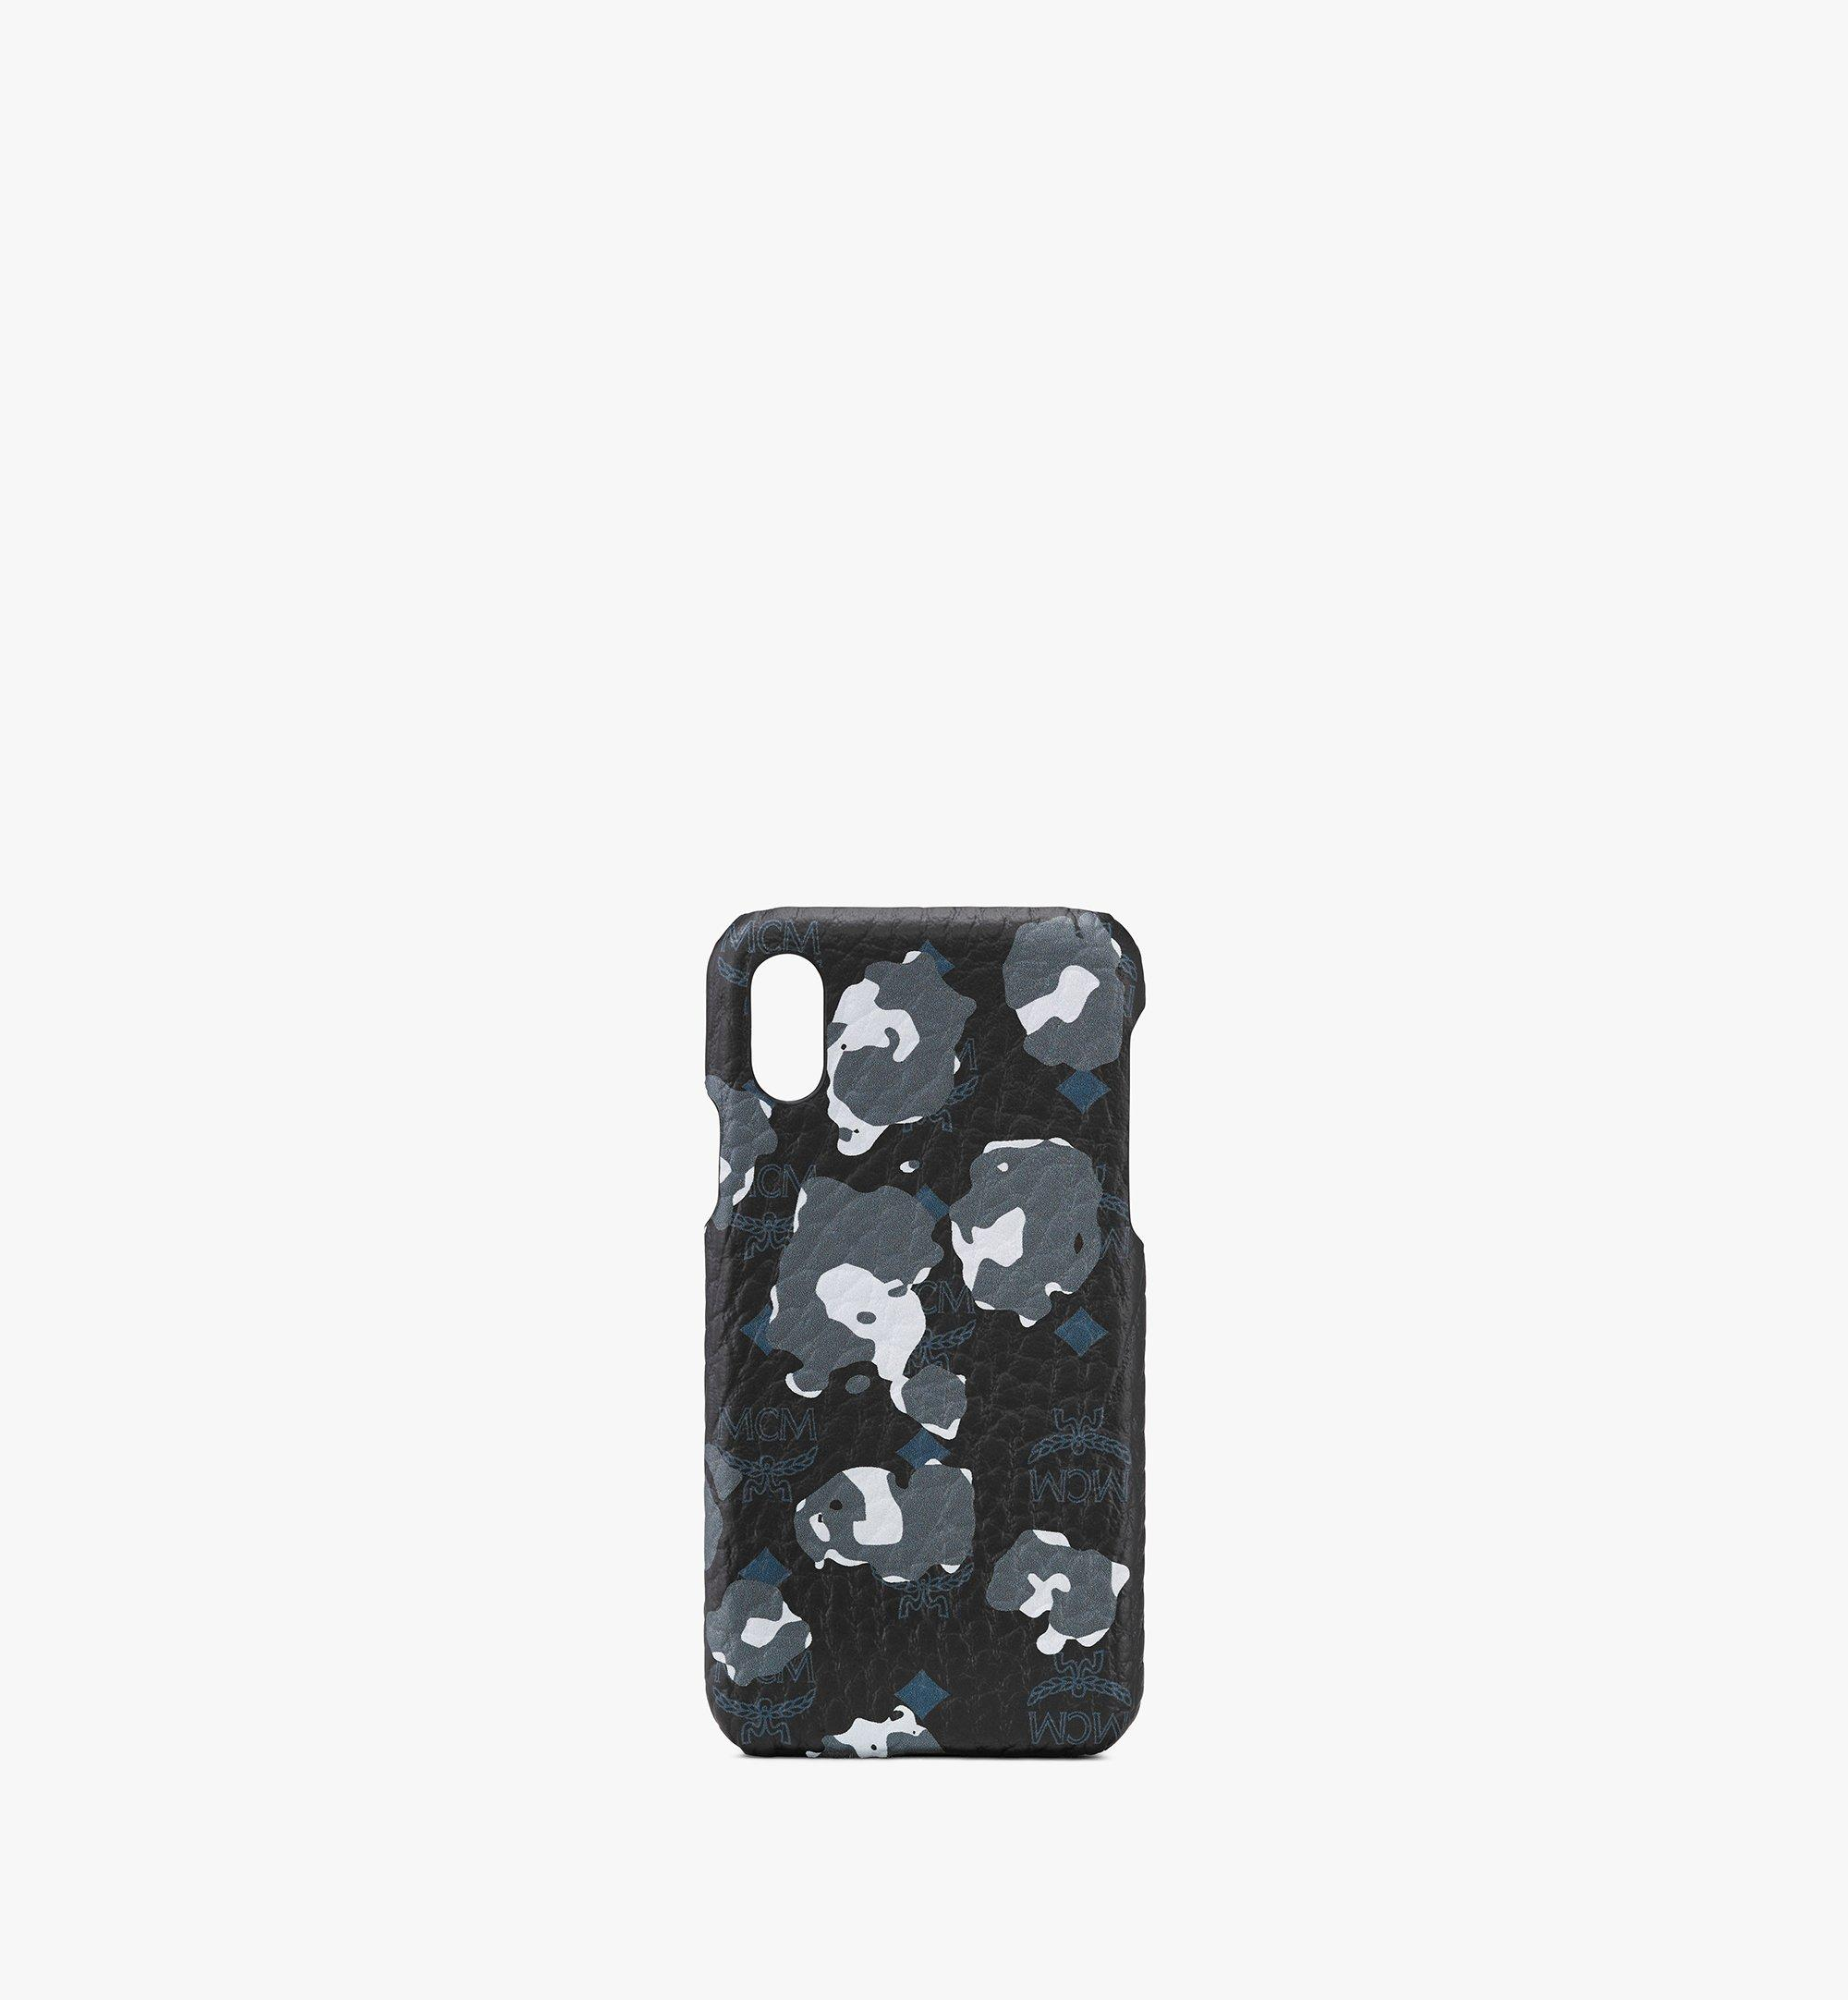 MCM 플로럴 레오파드 아이폰 케이스 Black MXEASLF01B1001 Alternate View 1